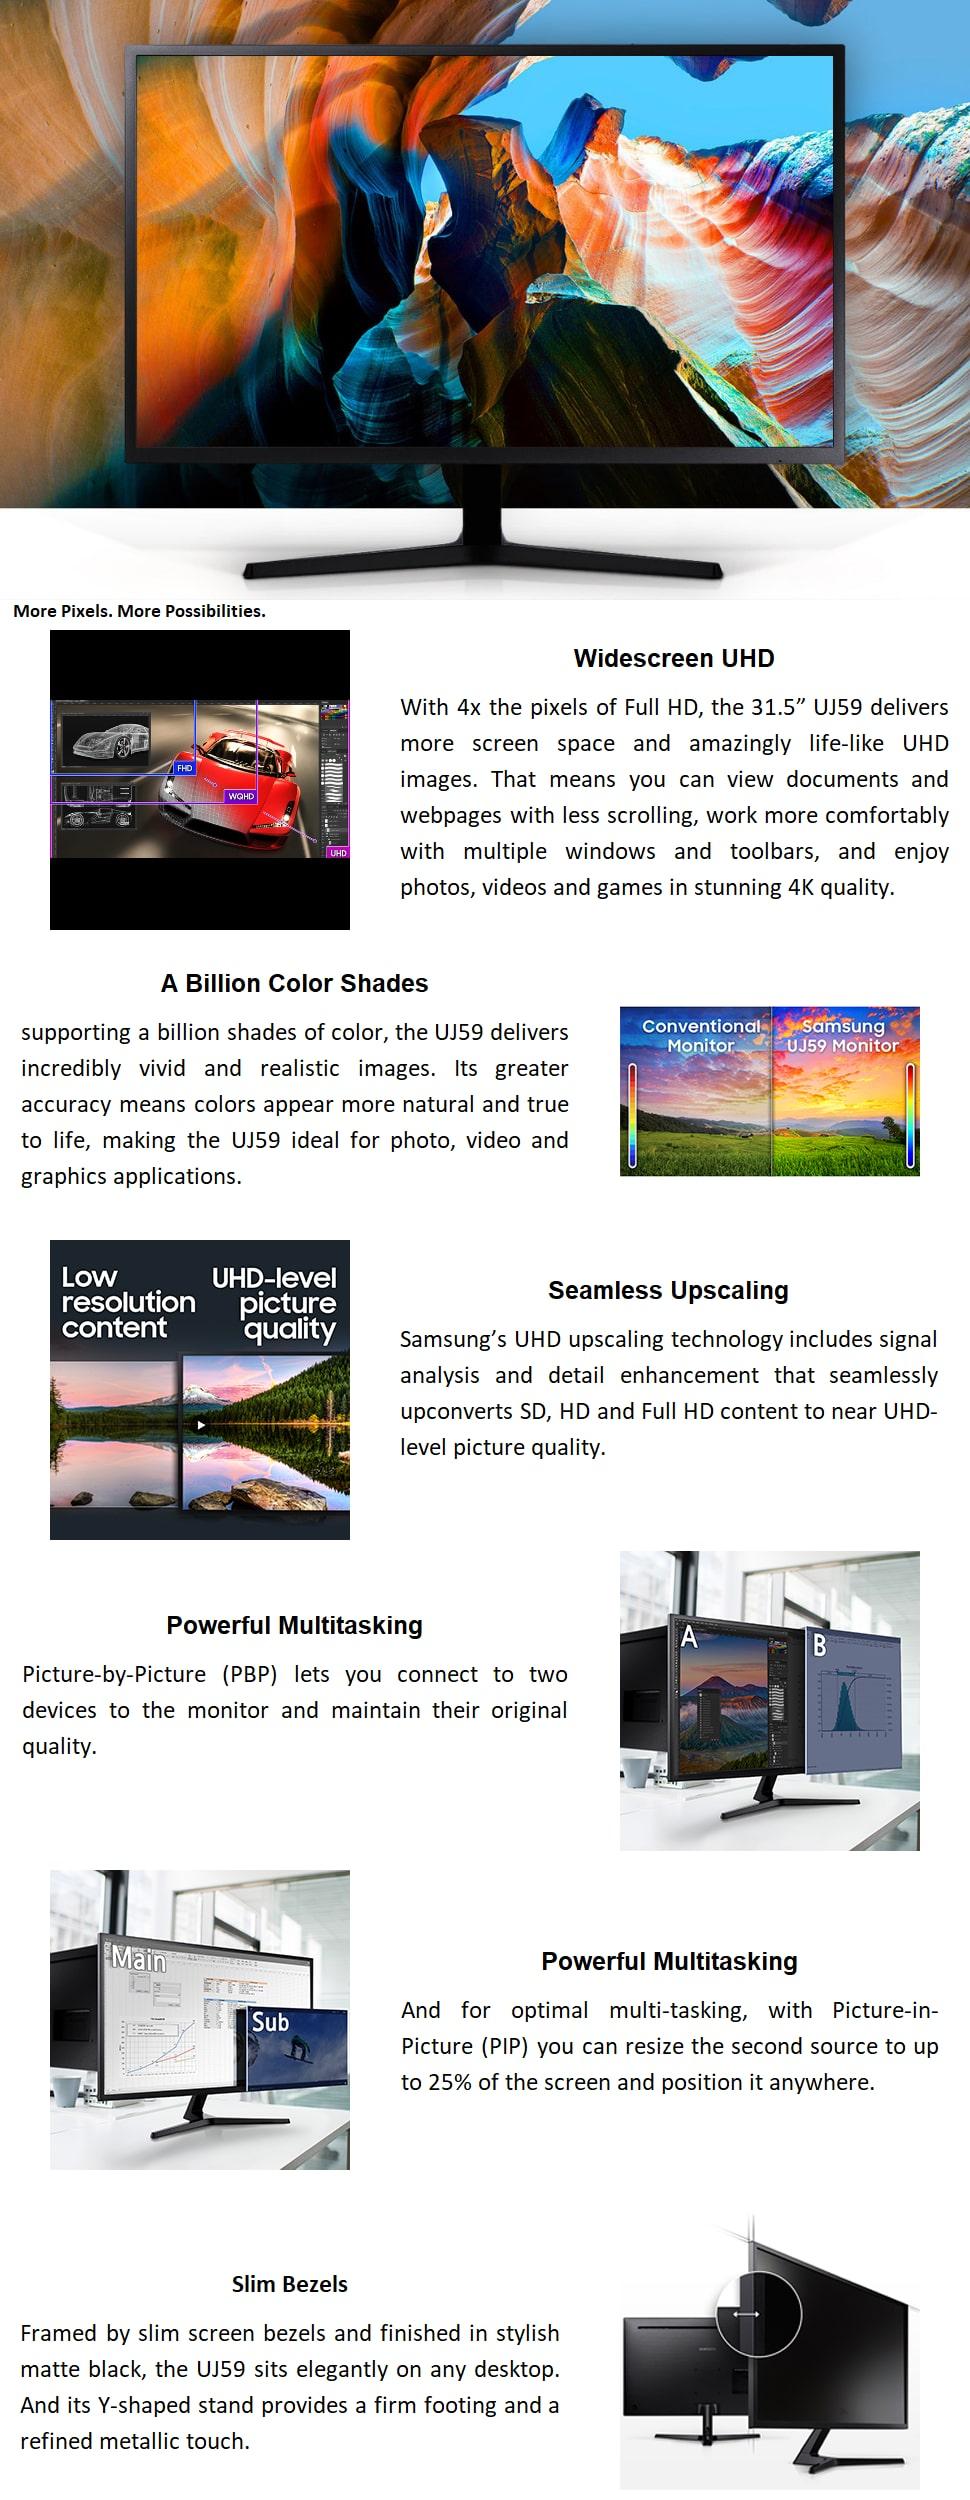 https://assetscdn1.paytm.com/images/catalog/product/L/LA/LARSAMSUNG-31-5DUMM2025613BFF96E/7.png